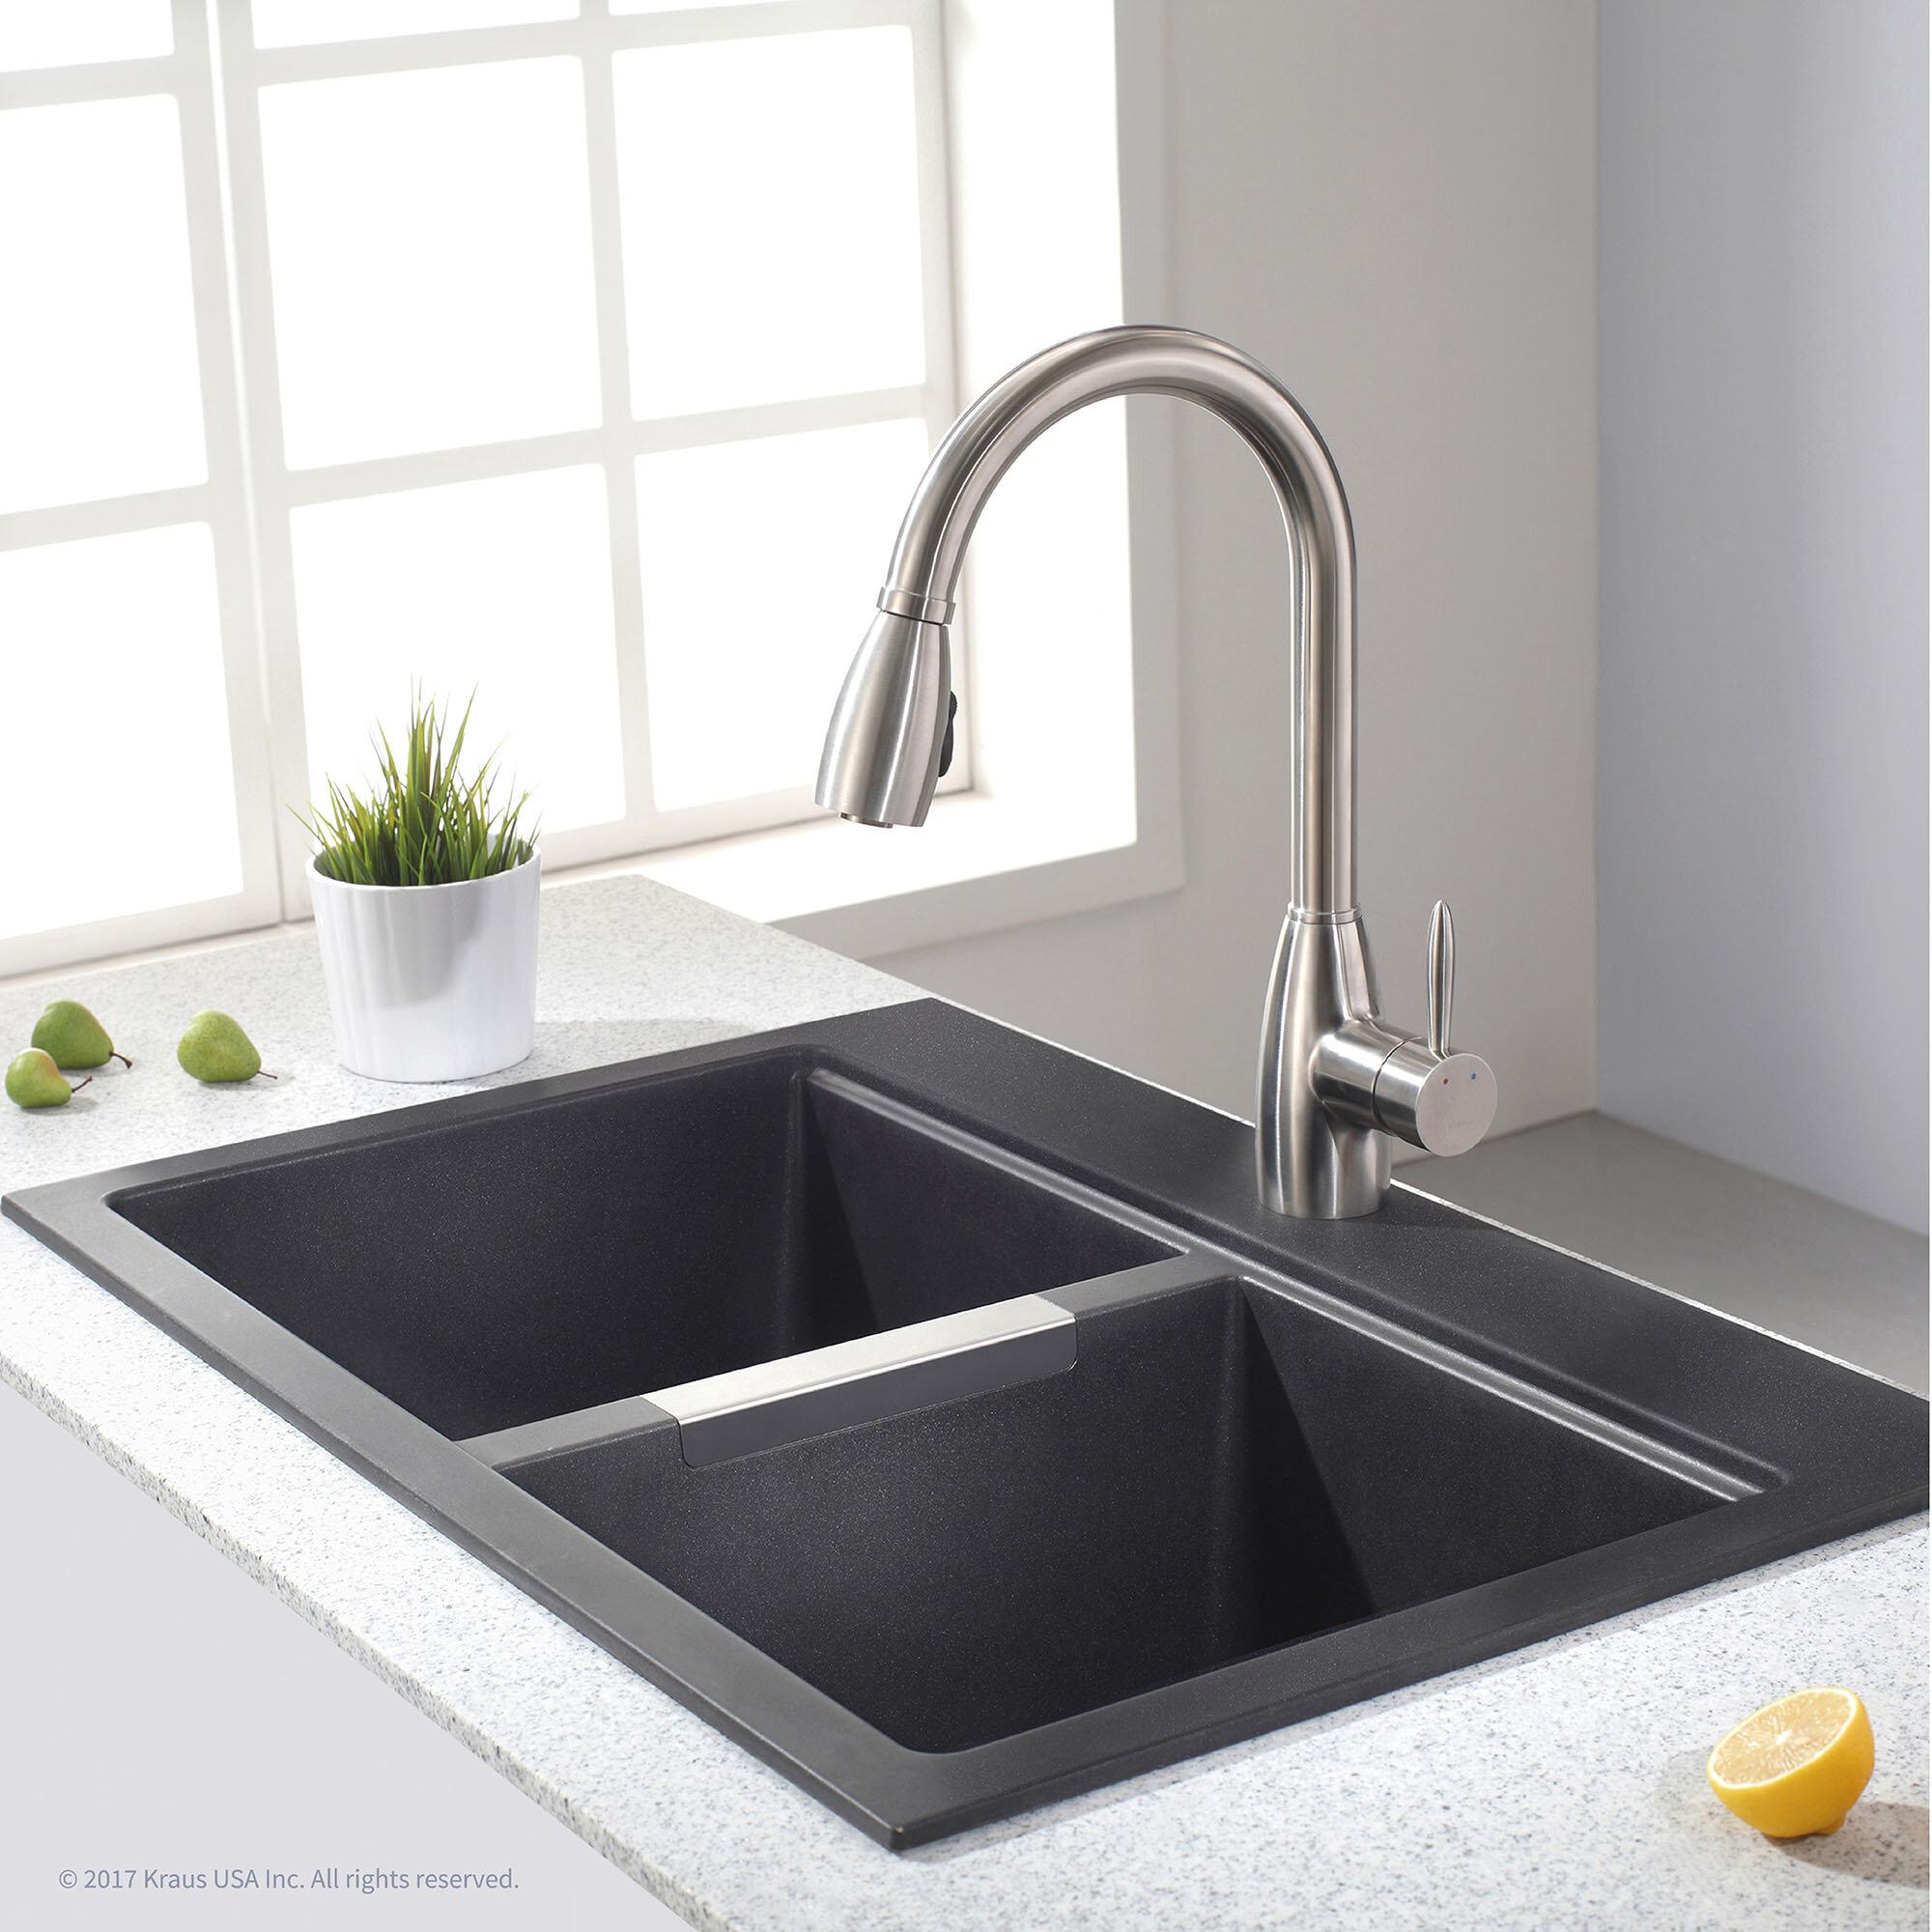 Kraus granite 33 l x 22 w double basin dual mount kitchen sink reviews wayfair ca